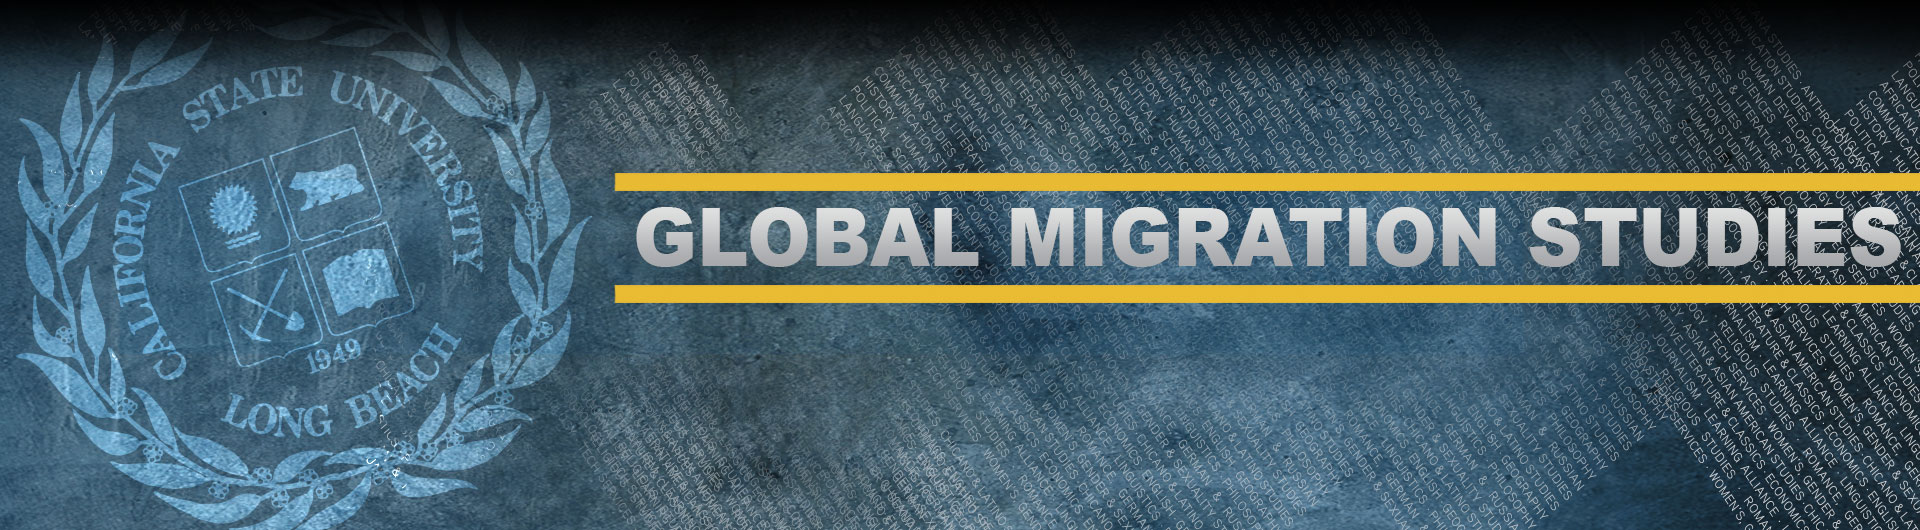 Global Migration Studies